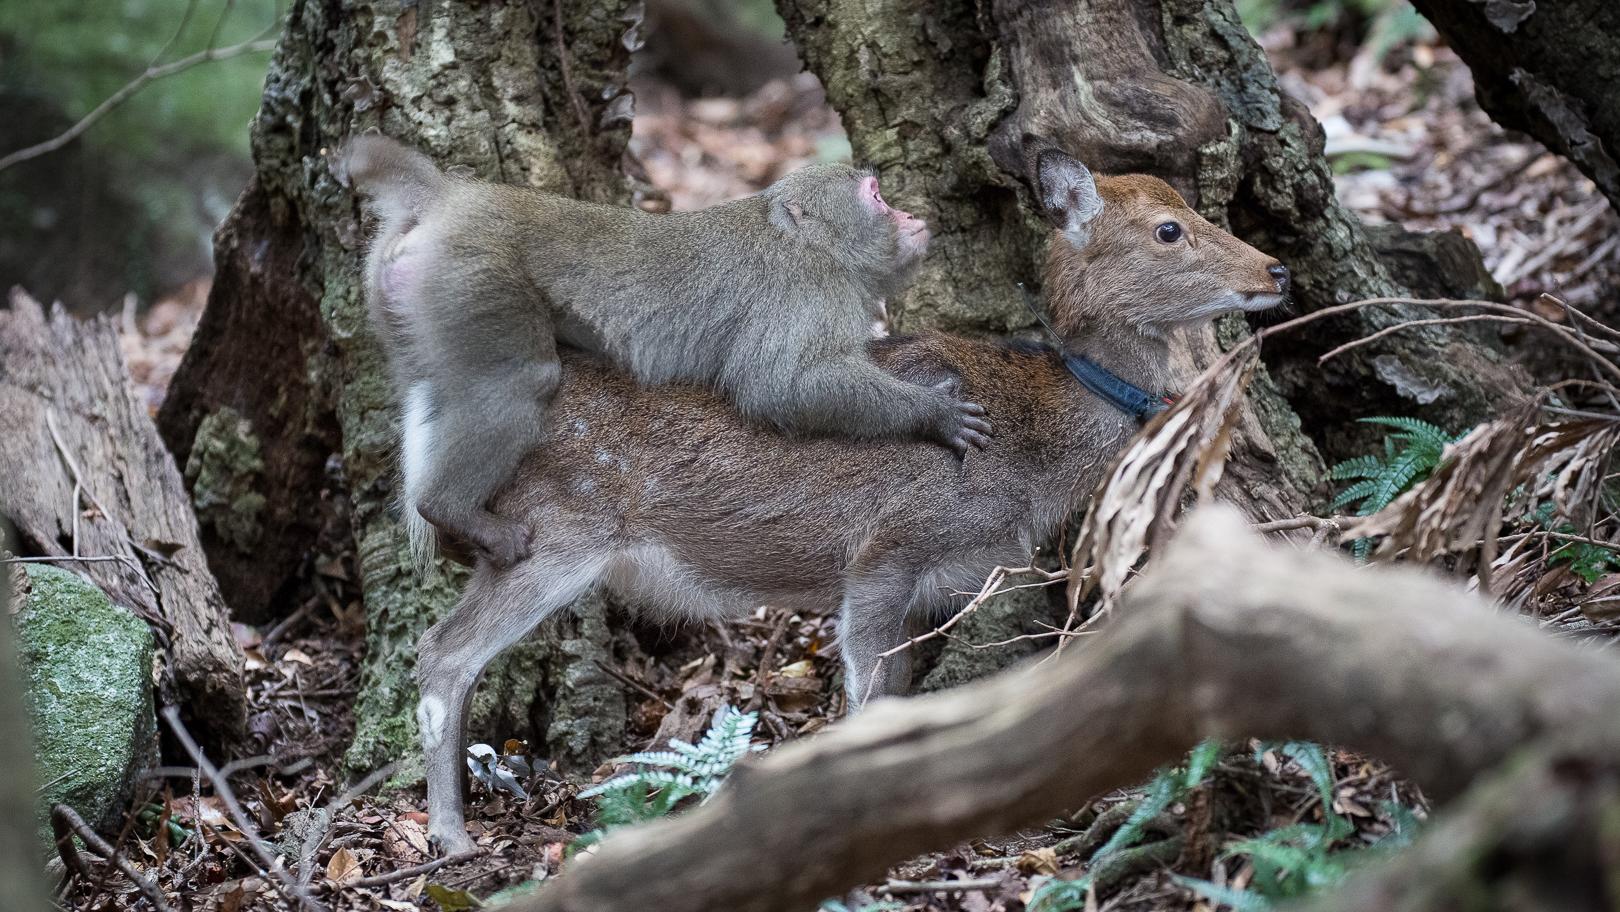 Animal Sec Movies monkey tries to mate with deer (rare interspecies behavior)